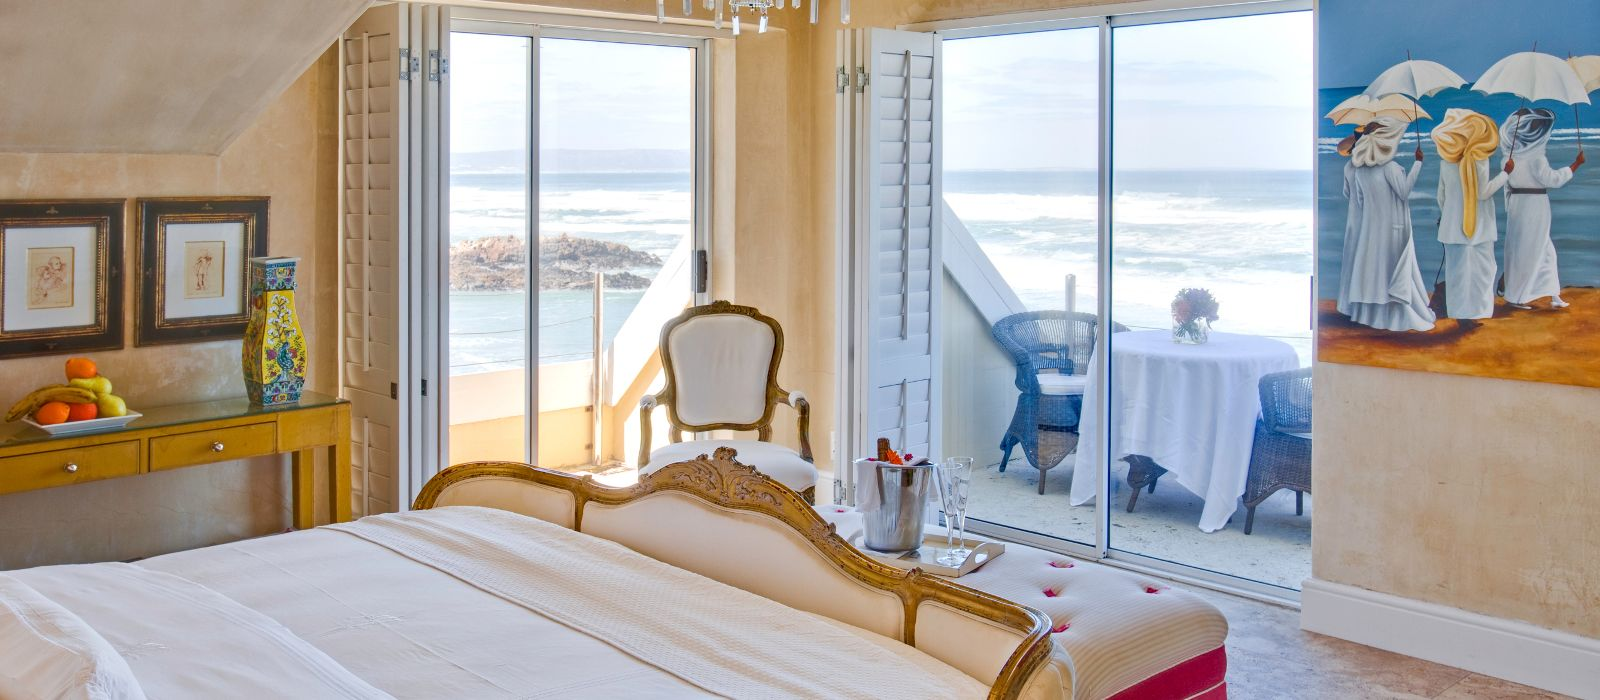 Hotel Birkenhead House South Africa